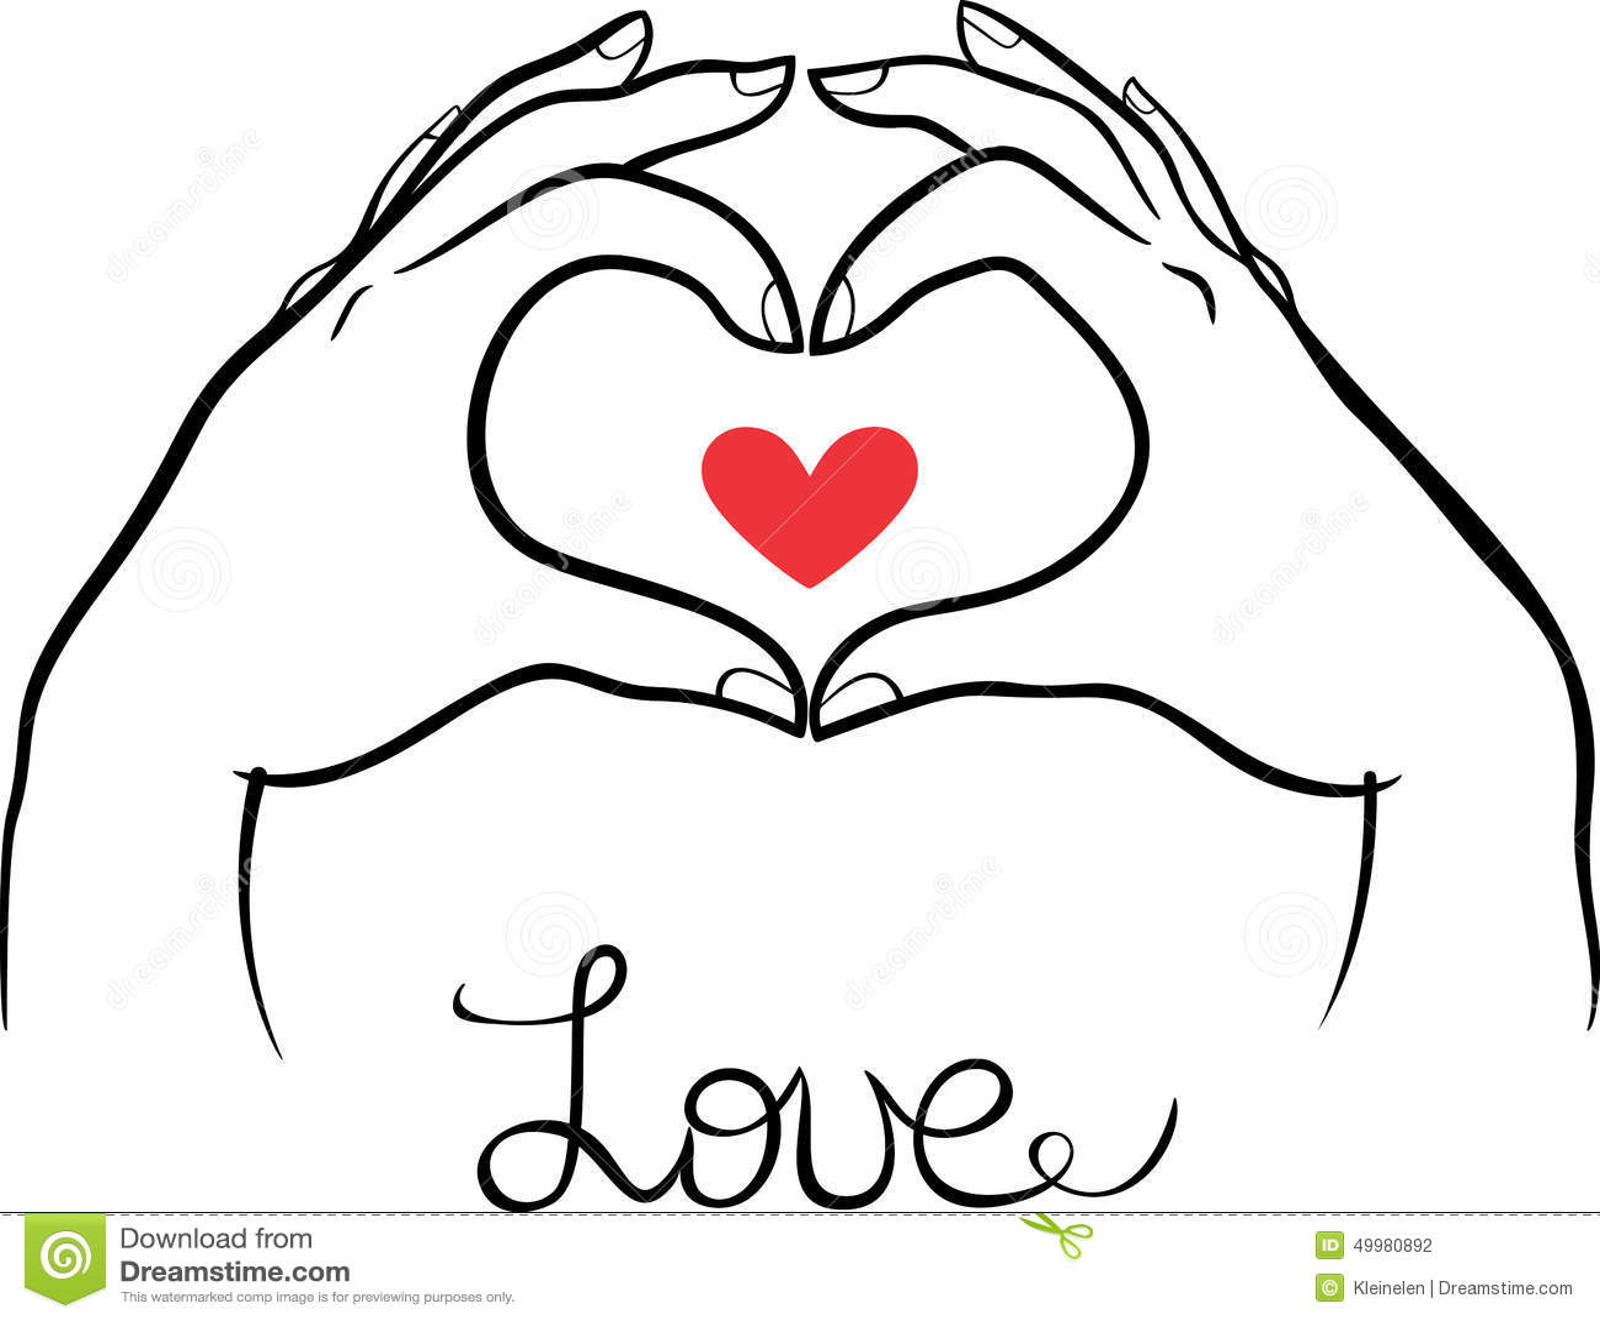 O D Heart